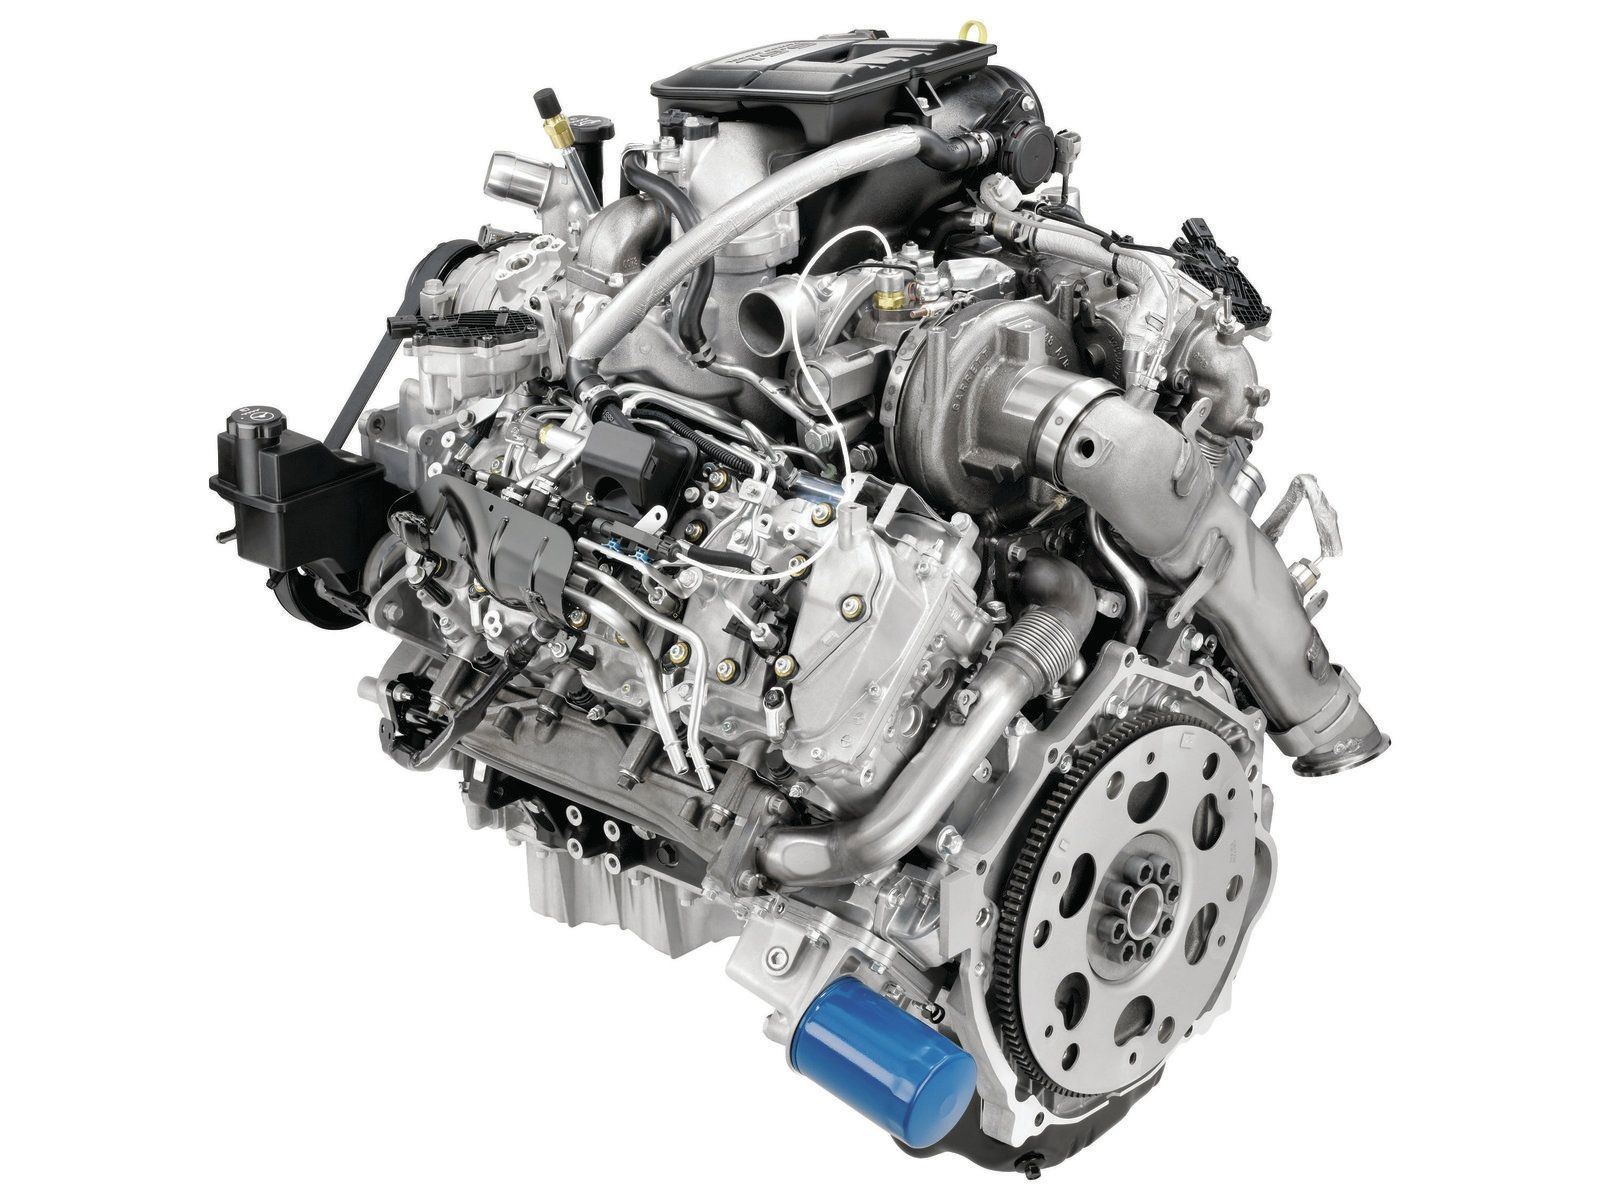 duramax diesel engine diagram 2016 chevrolet colorado 2 8l duramax rh detoxicrecenze com GM Duramax Fuel System Diagram Duramax LB7 Fuel System Diagram